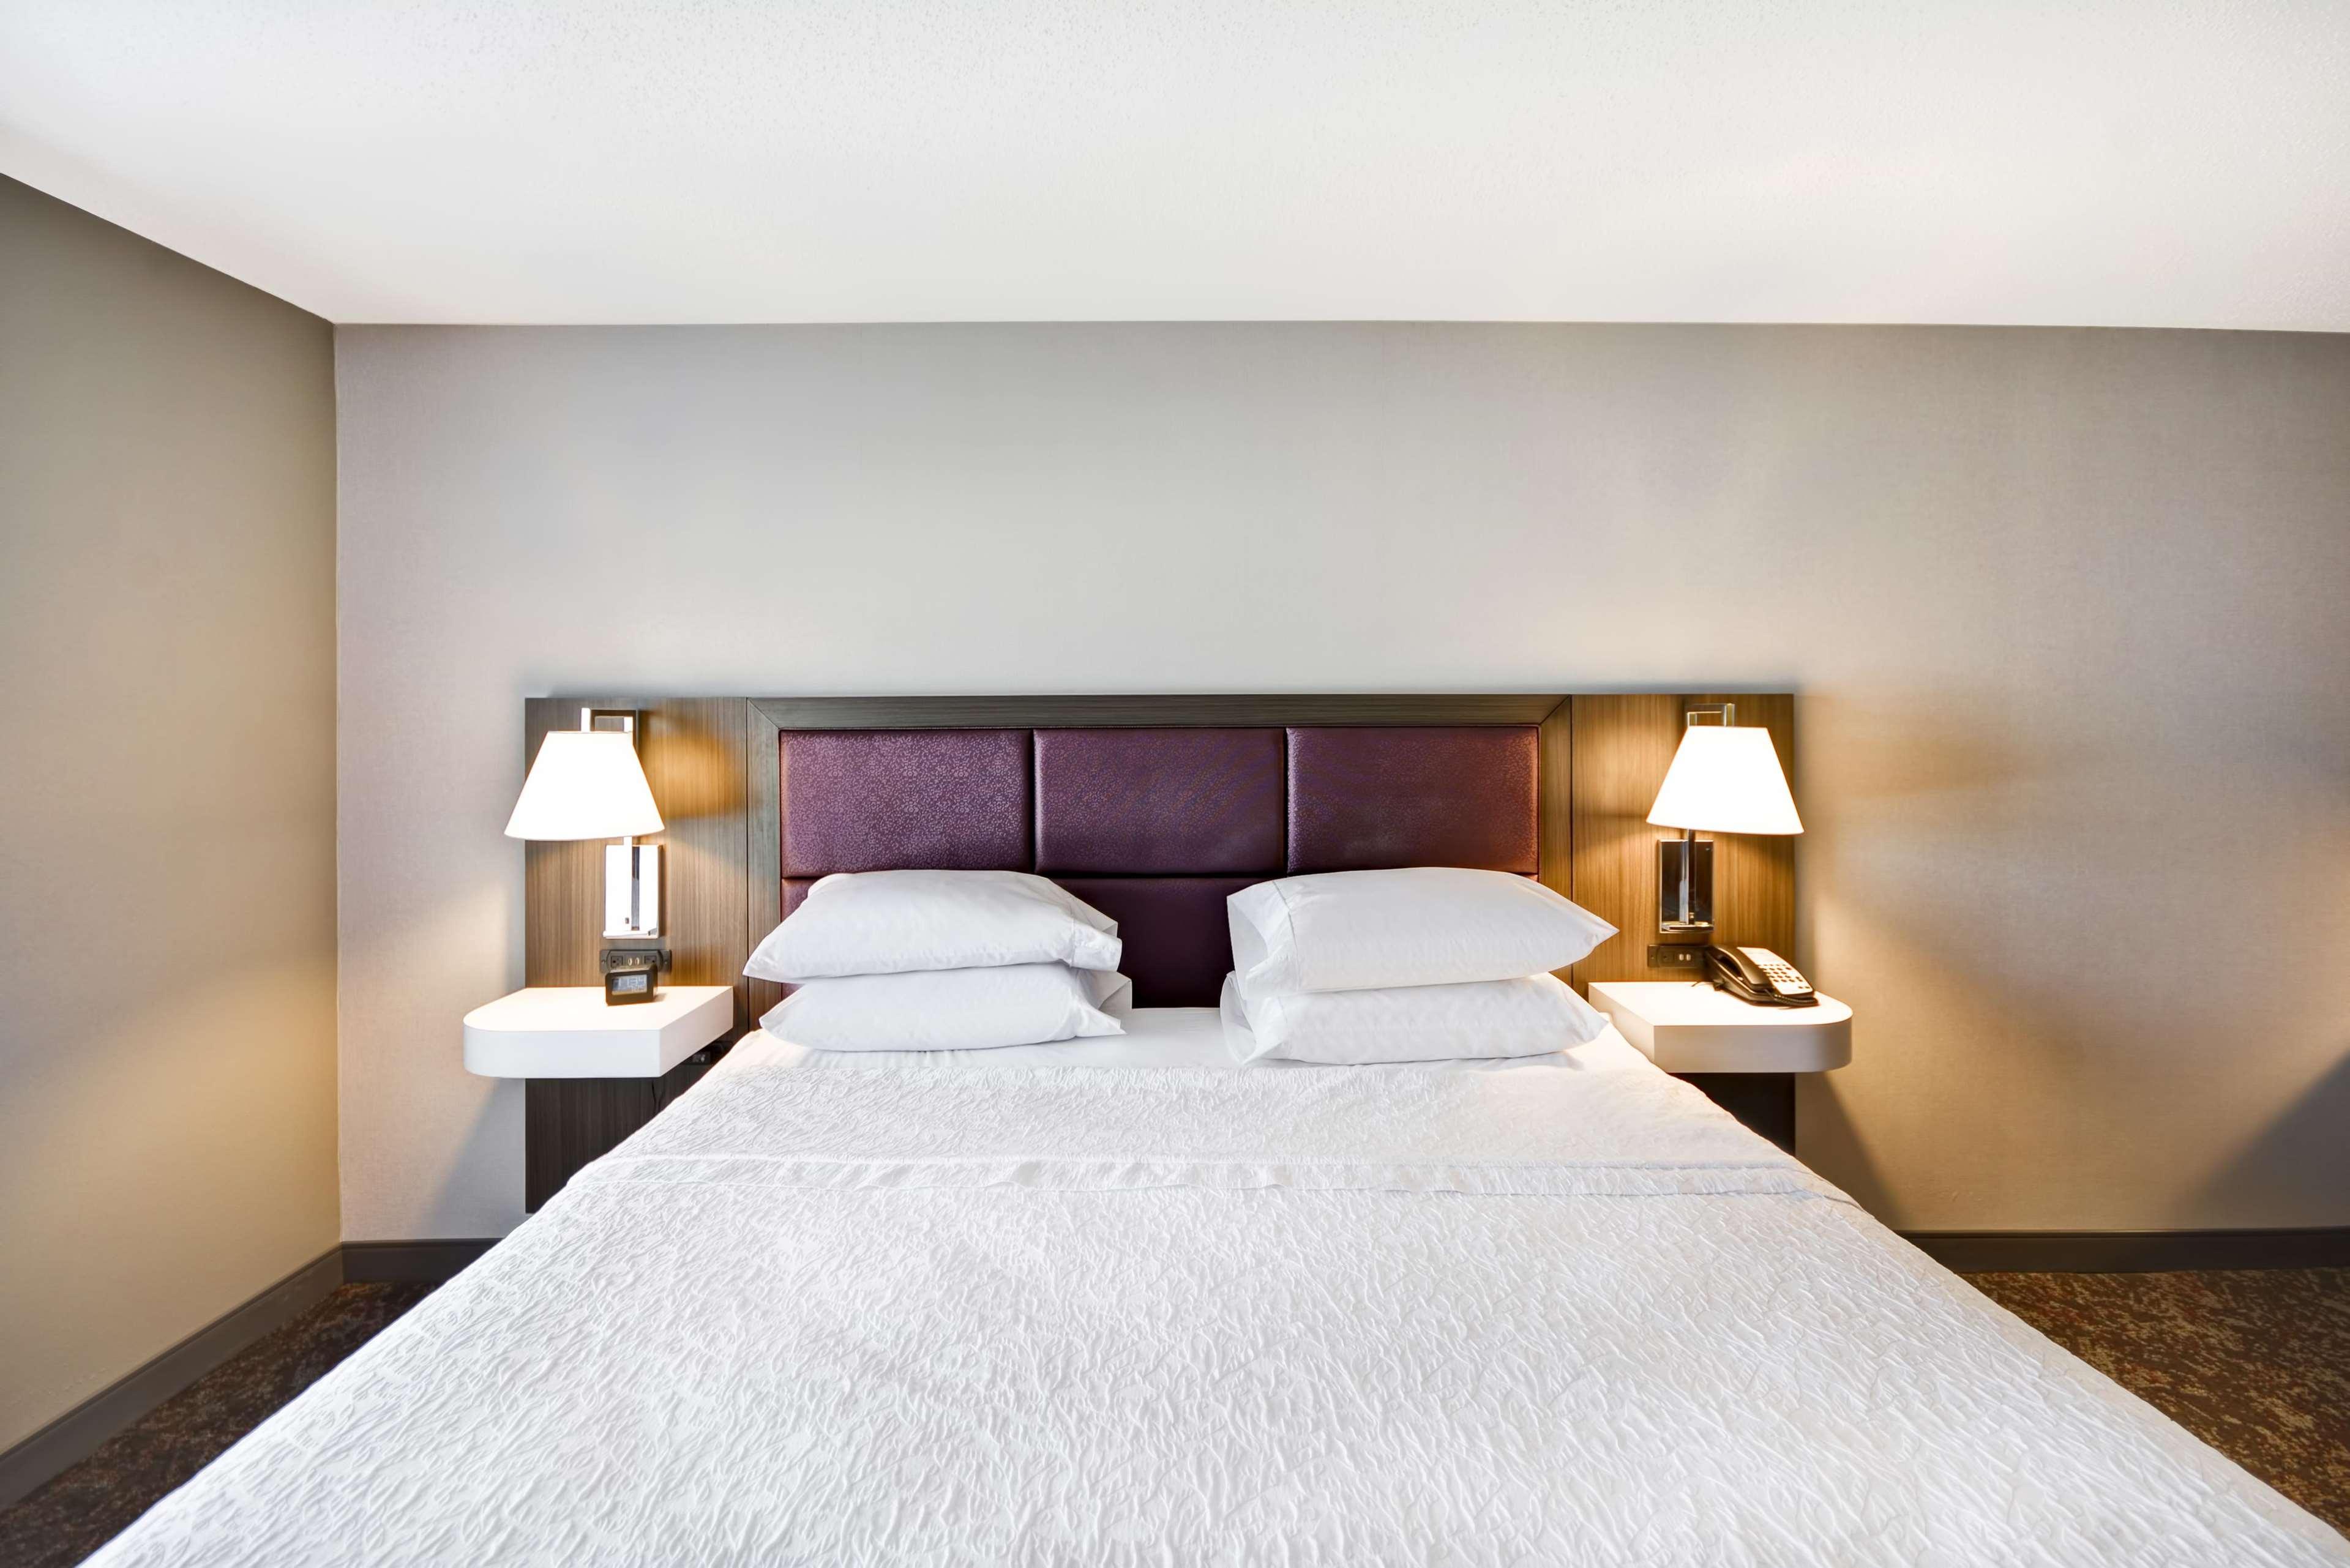 Hampton Inn & Suites Columbus-Easton Area image 50